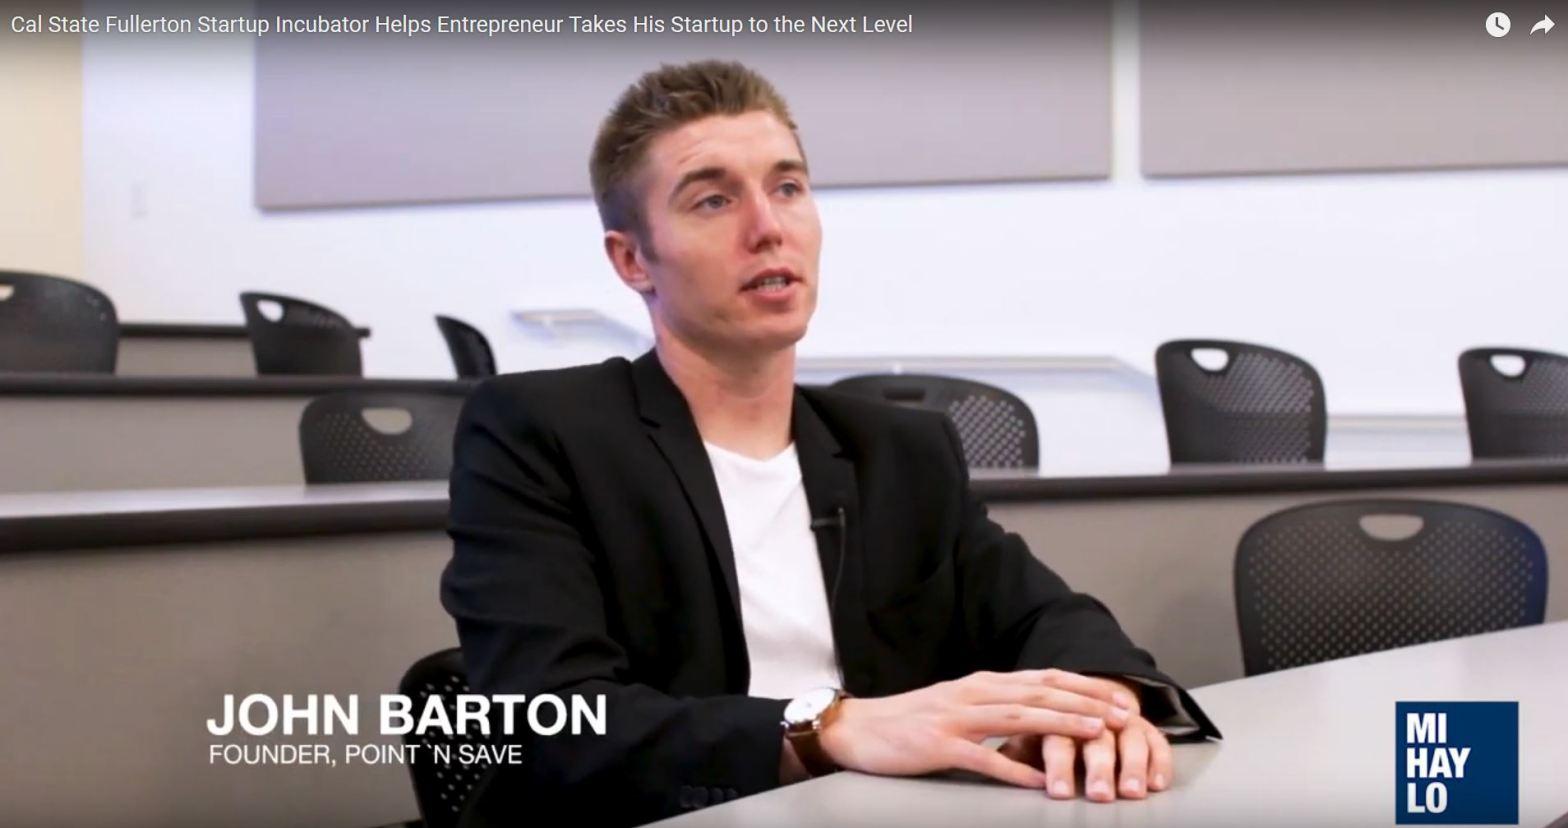 John Barton - CSUF Startup Incubator